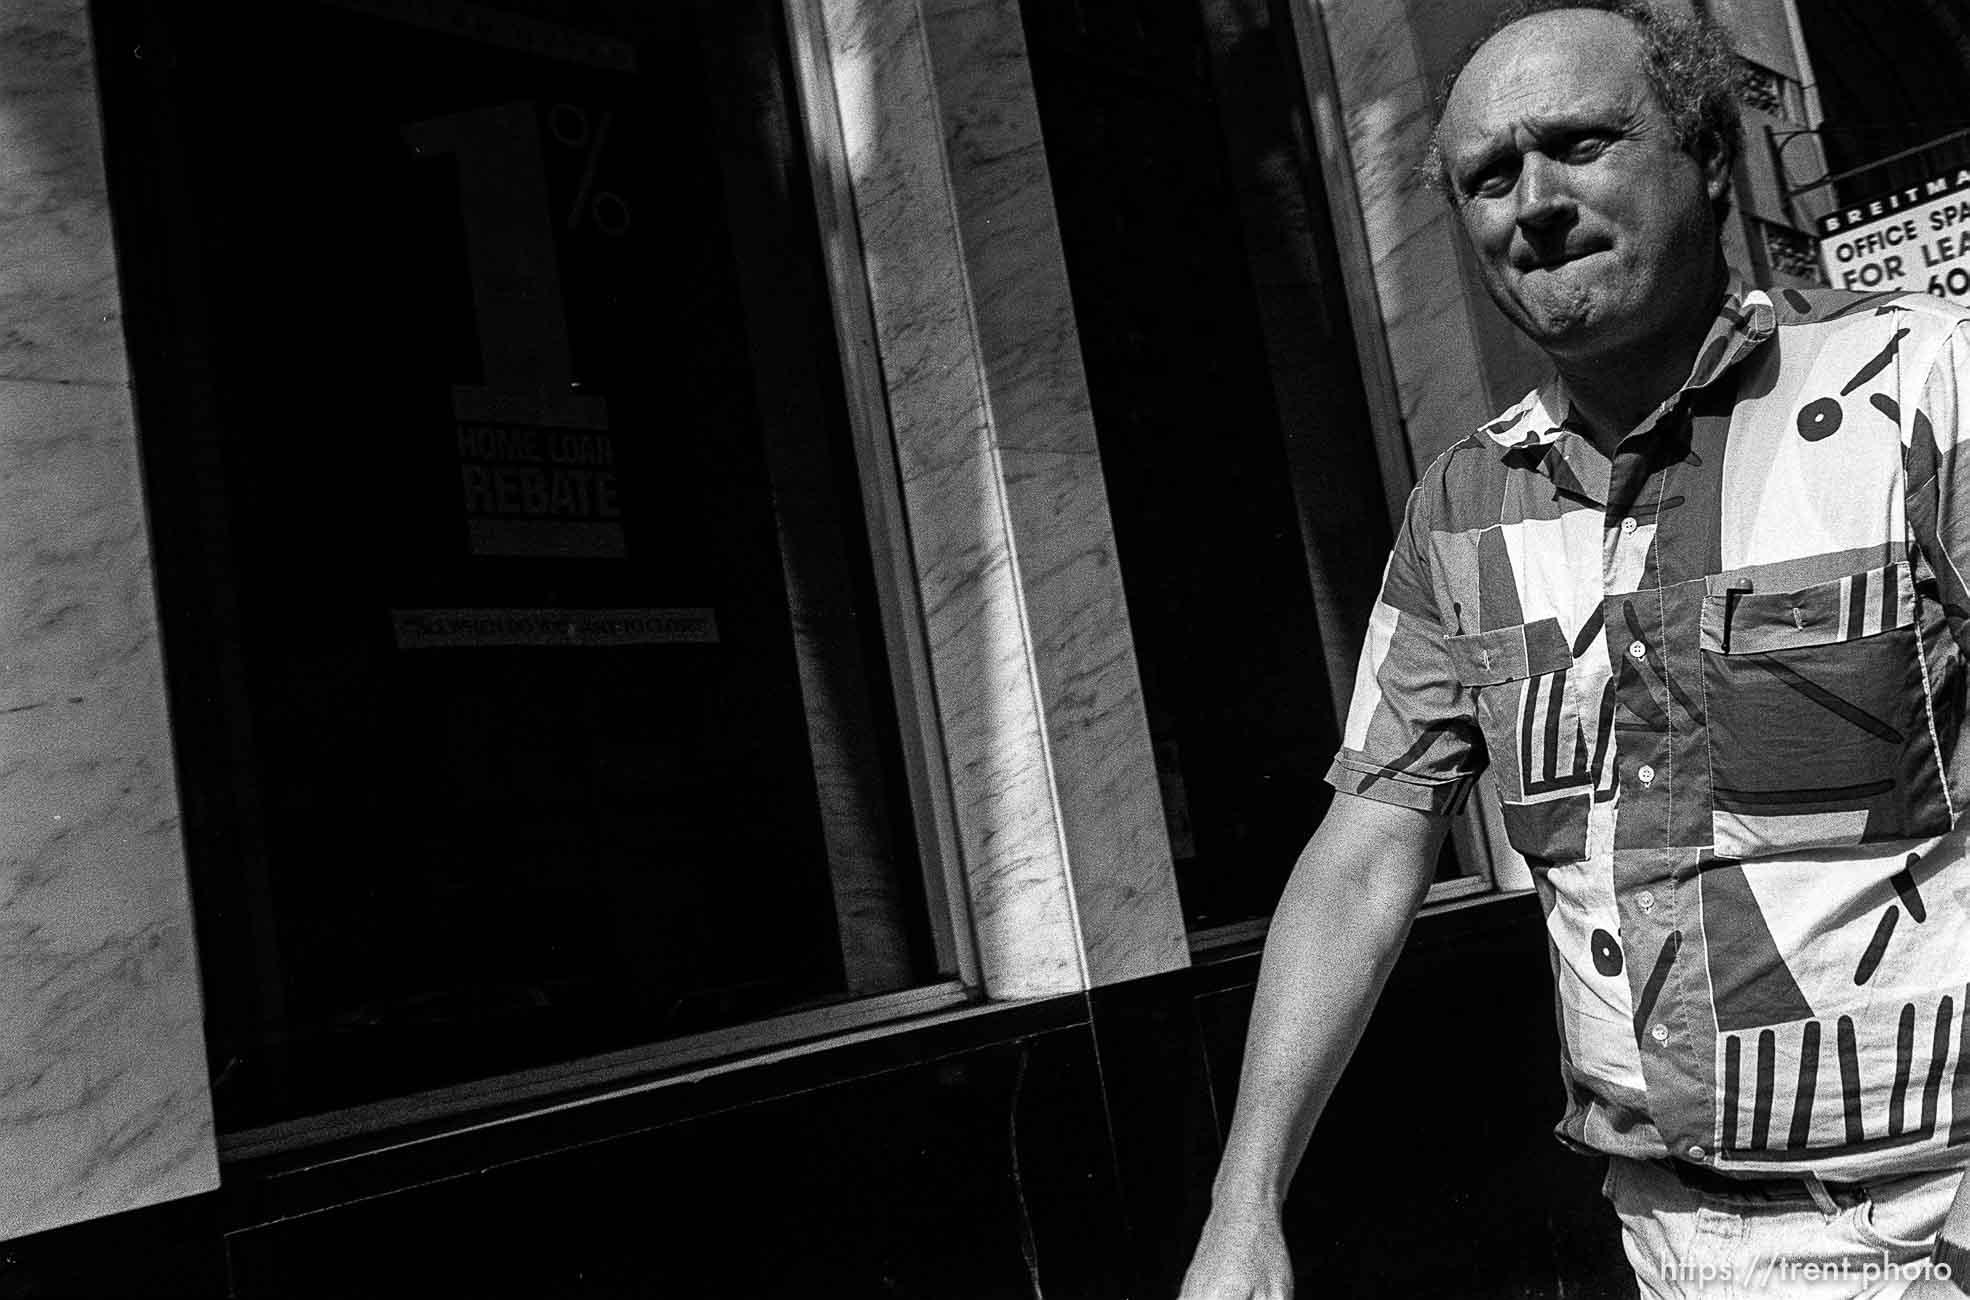 Man. Leica hip shots on the street.